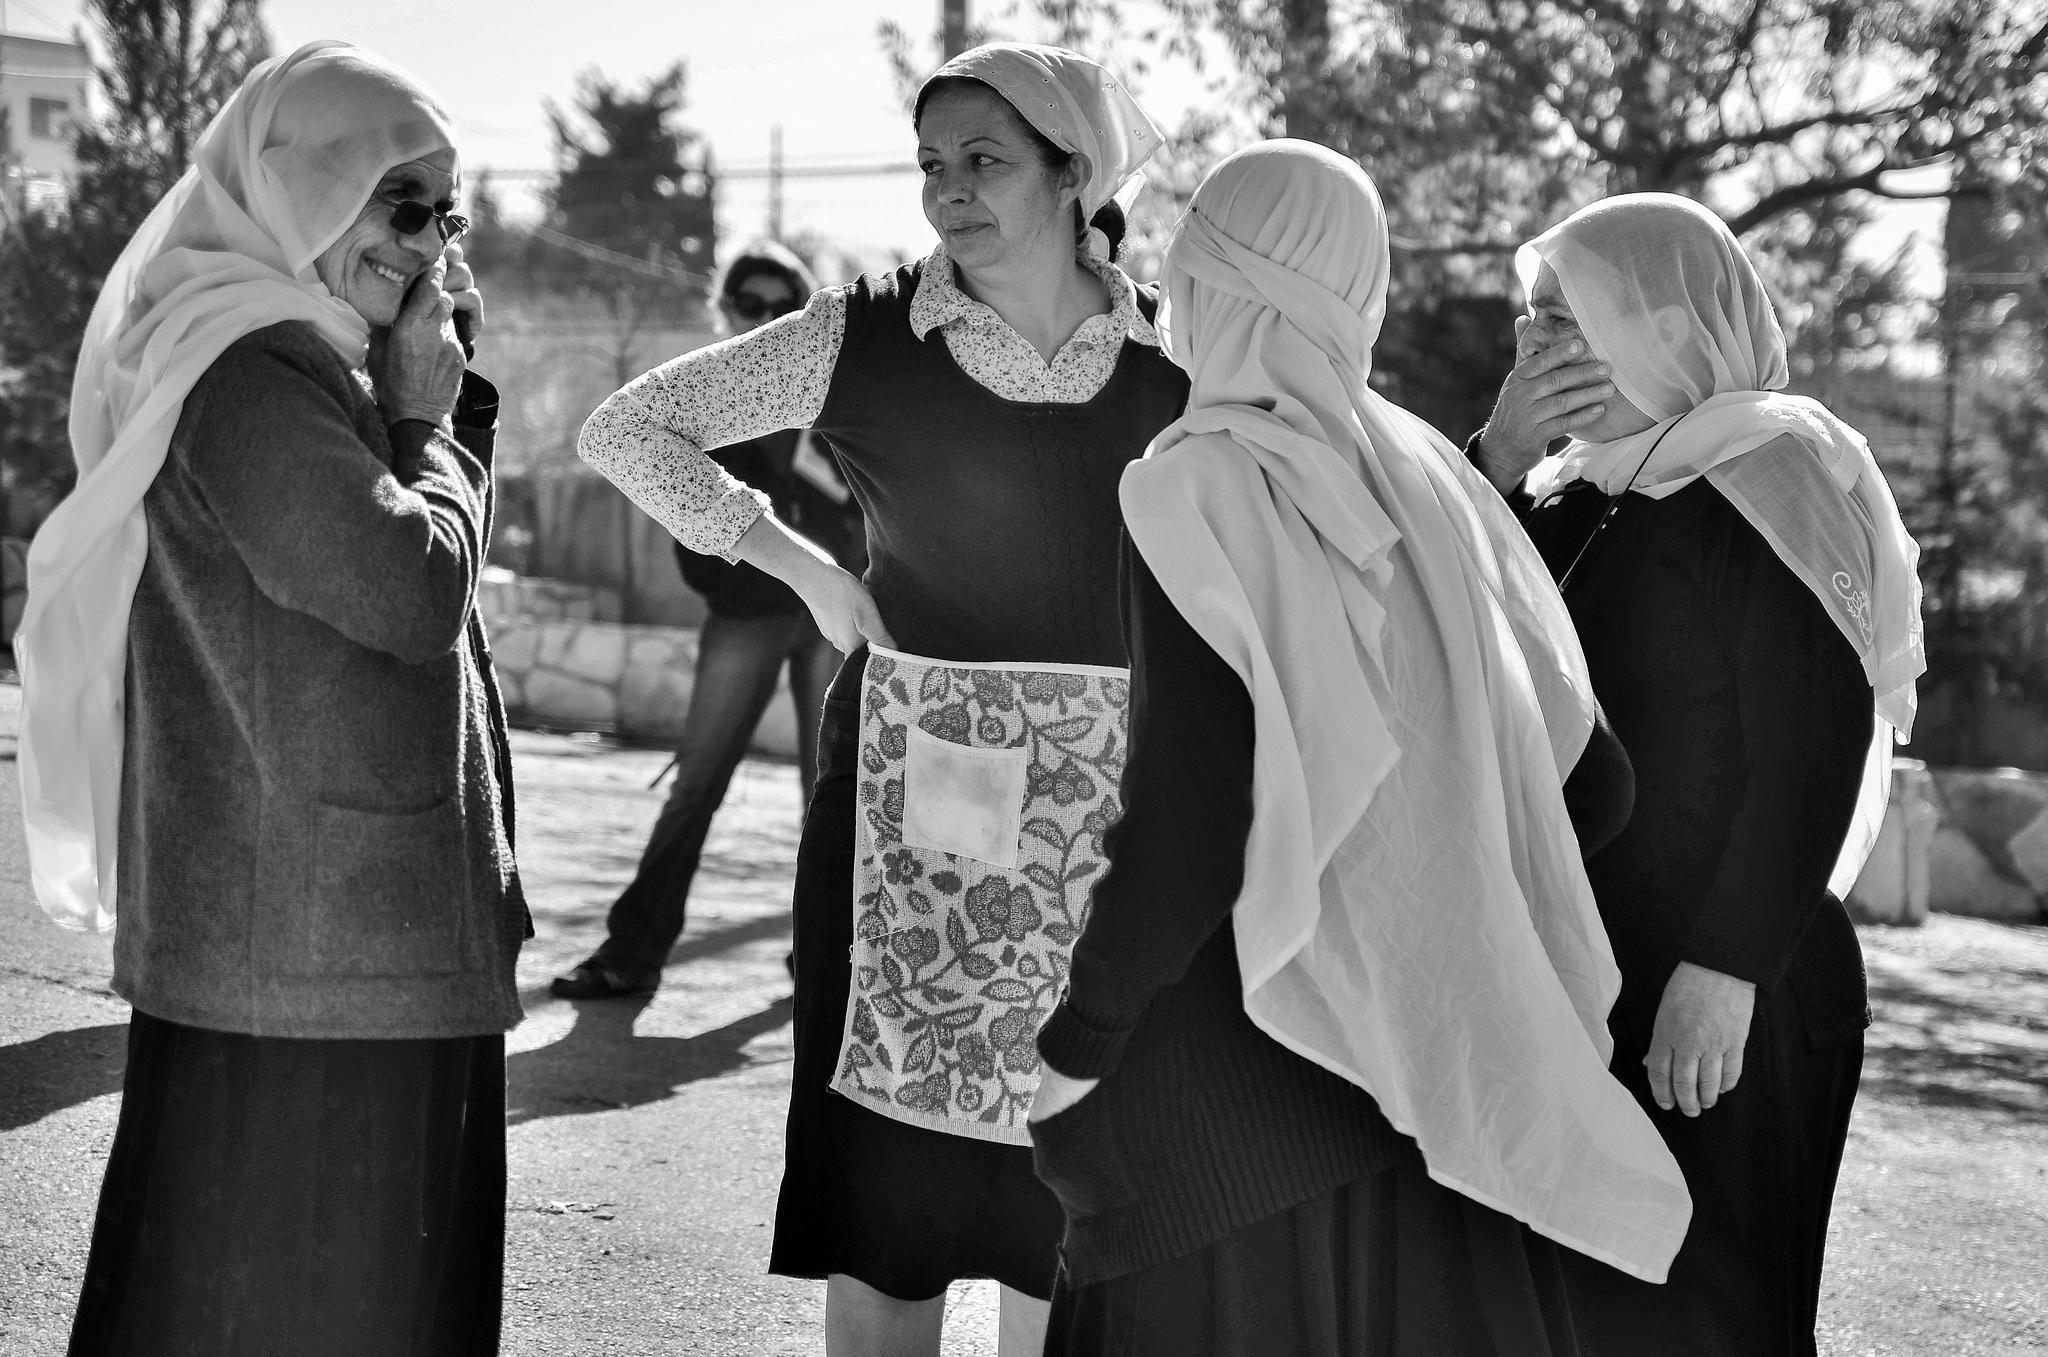 Growing number of Druze believers in Syria